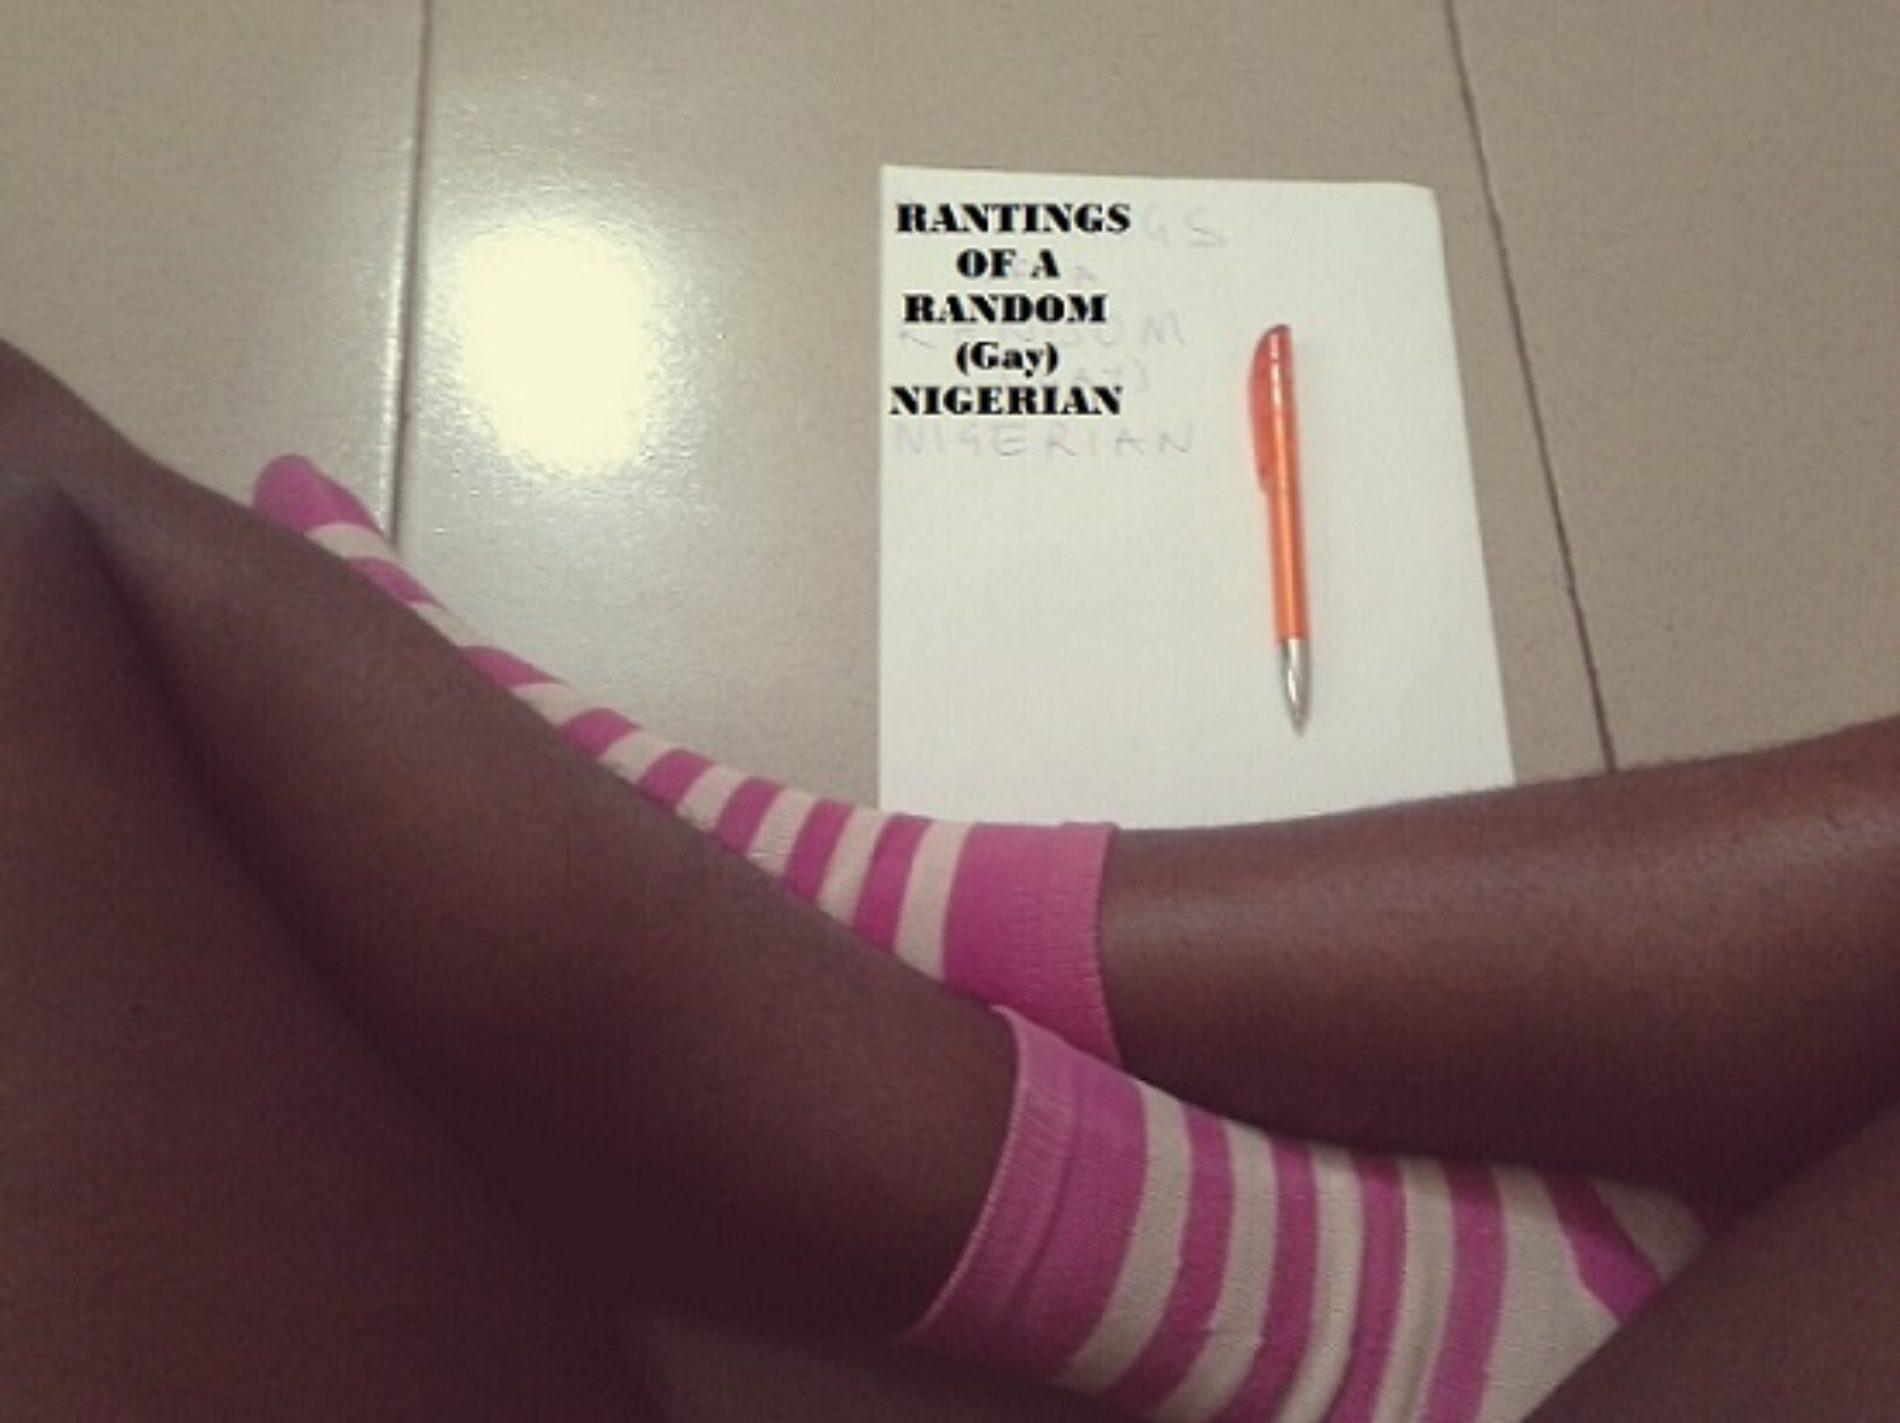 RANTINGS OF A RANDOM (Gay) NIGERIAN (Entry 17)